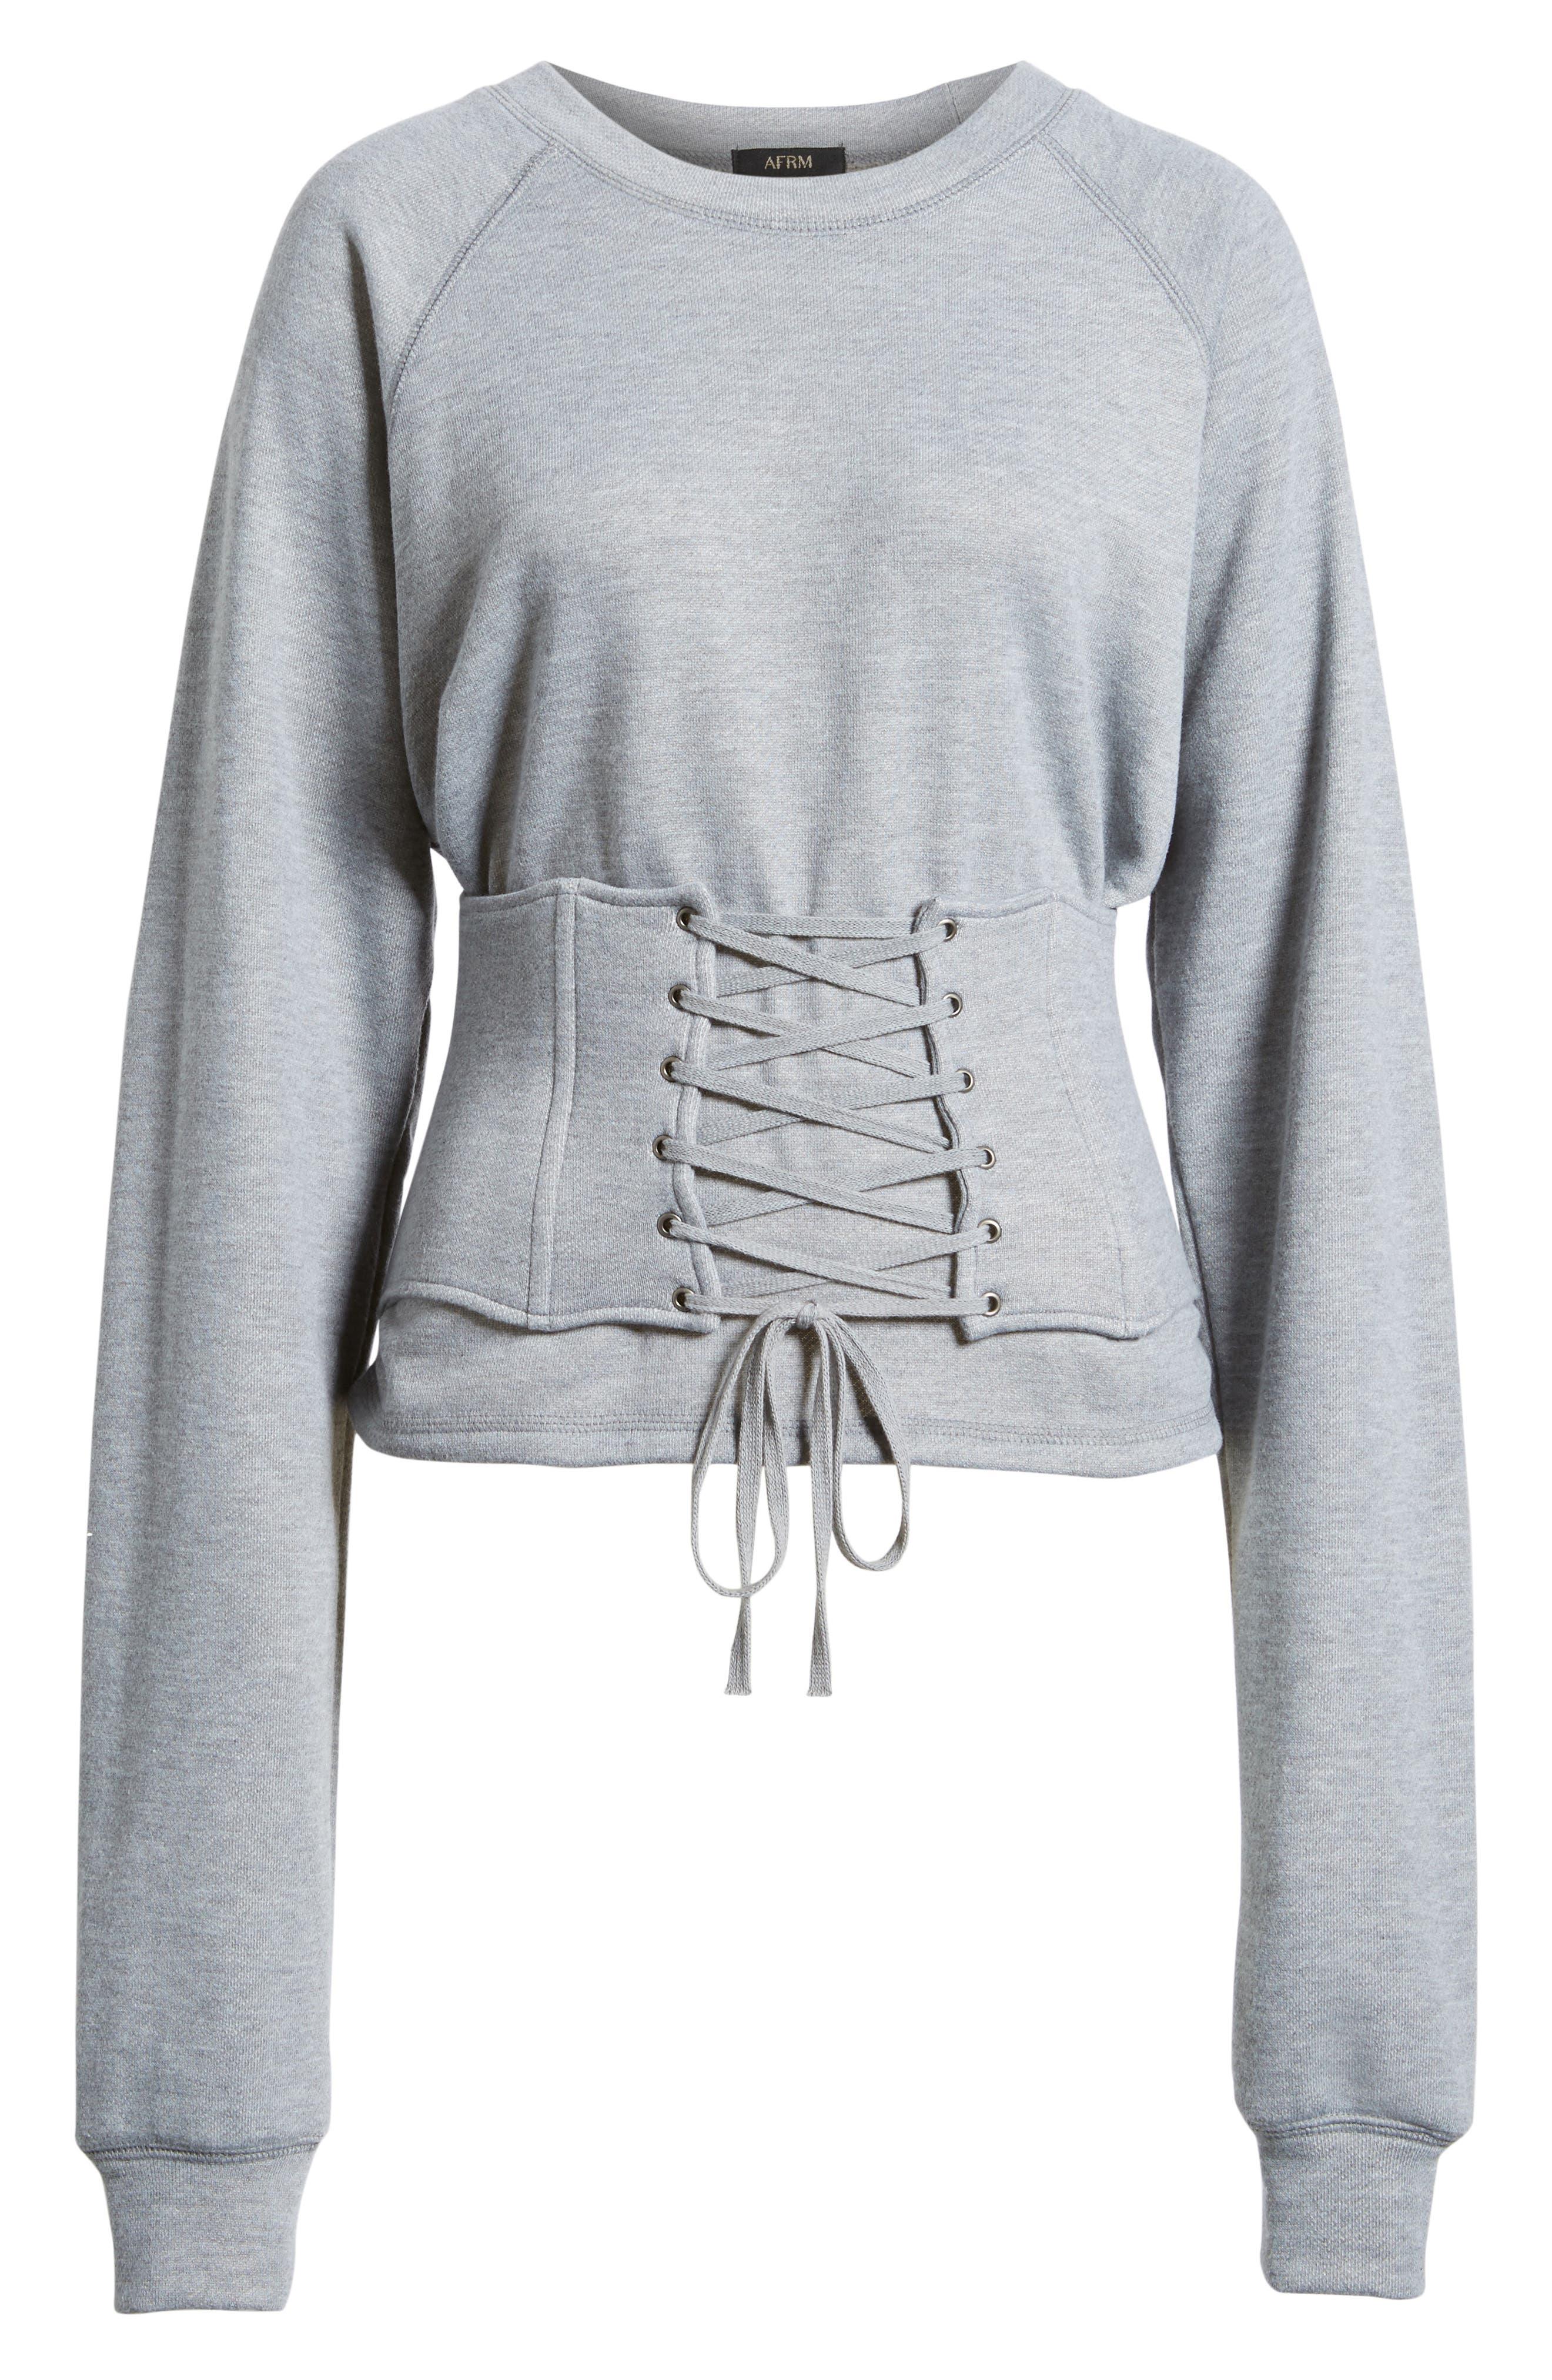 Mason Corset Sweatshirt,                             Alternate thumbnail 6, color,                             Heather Grey